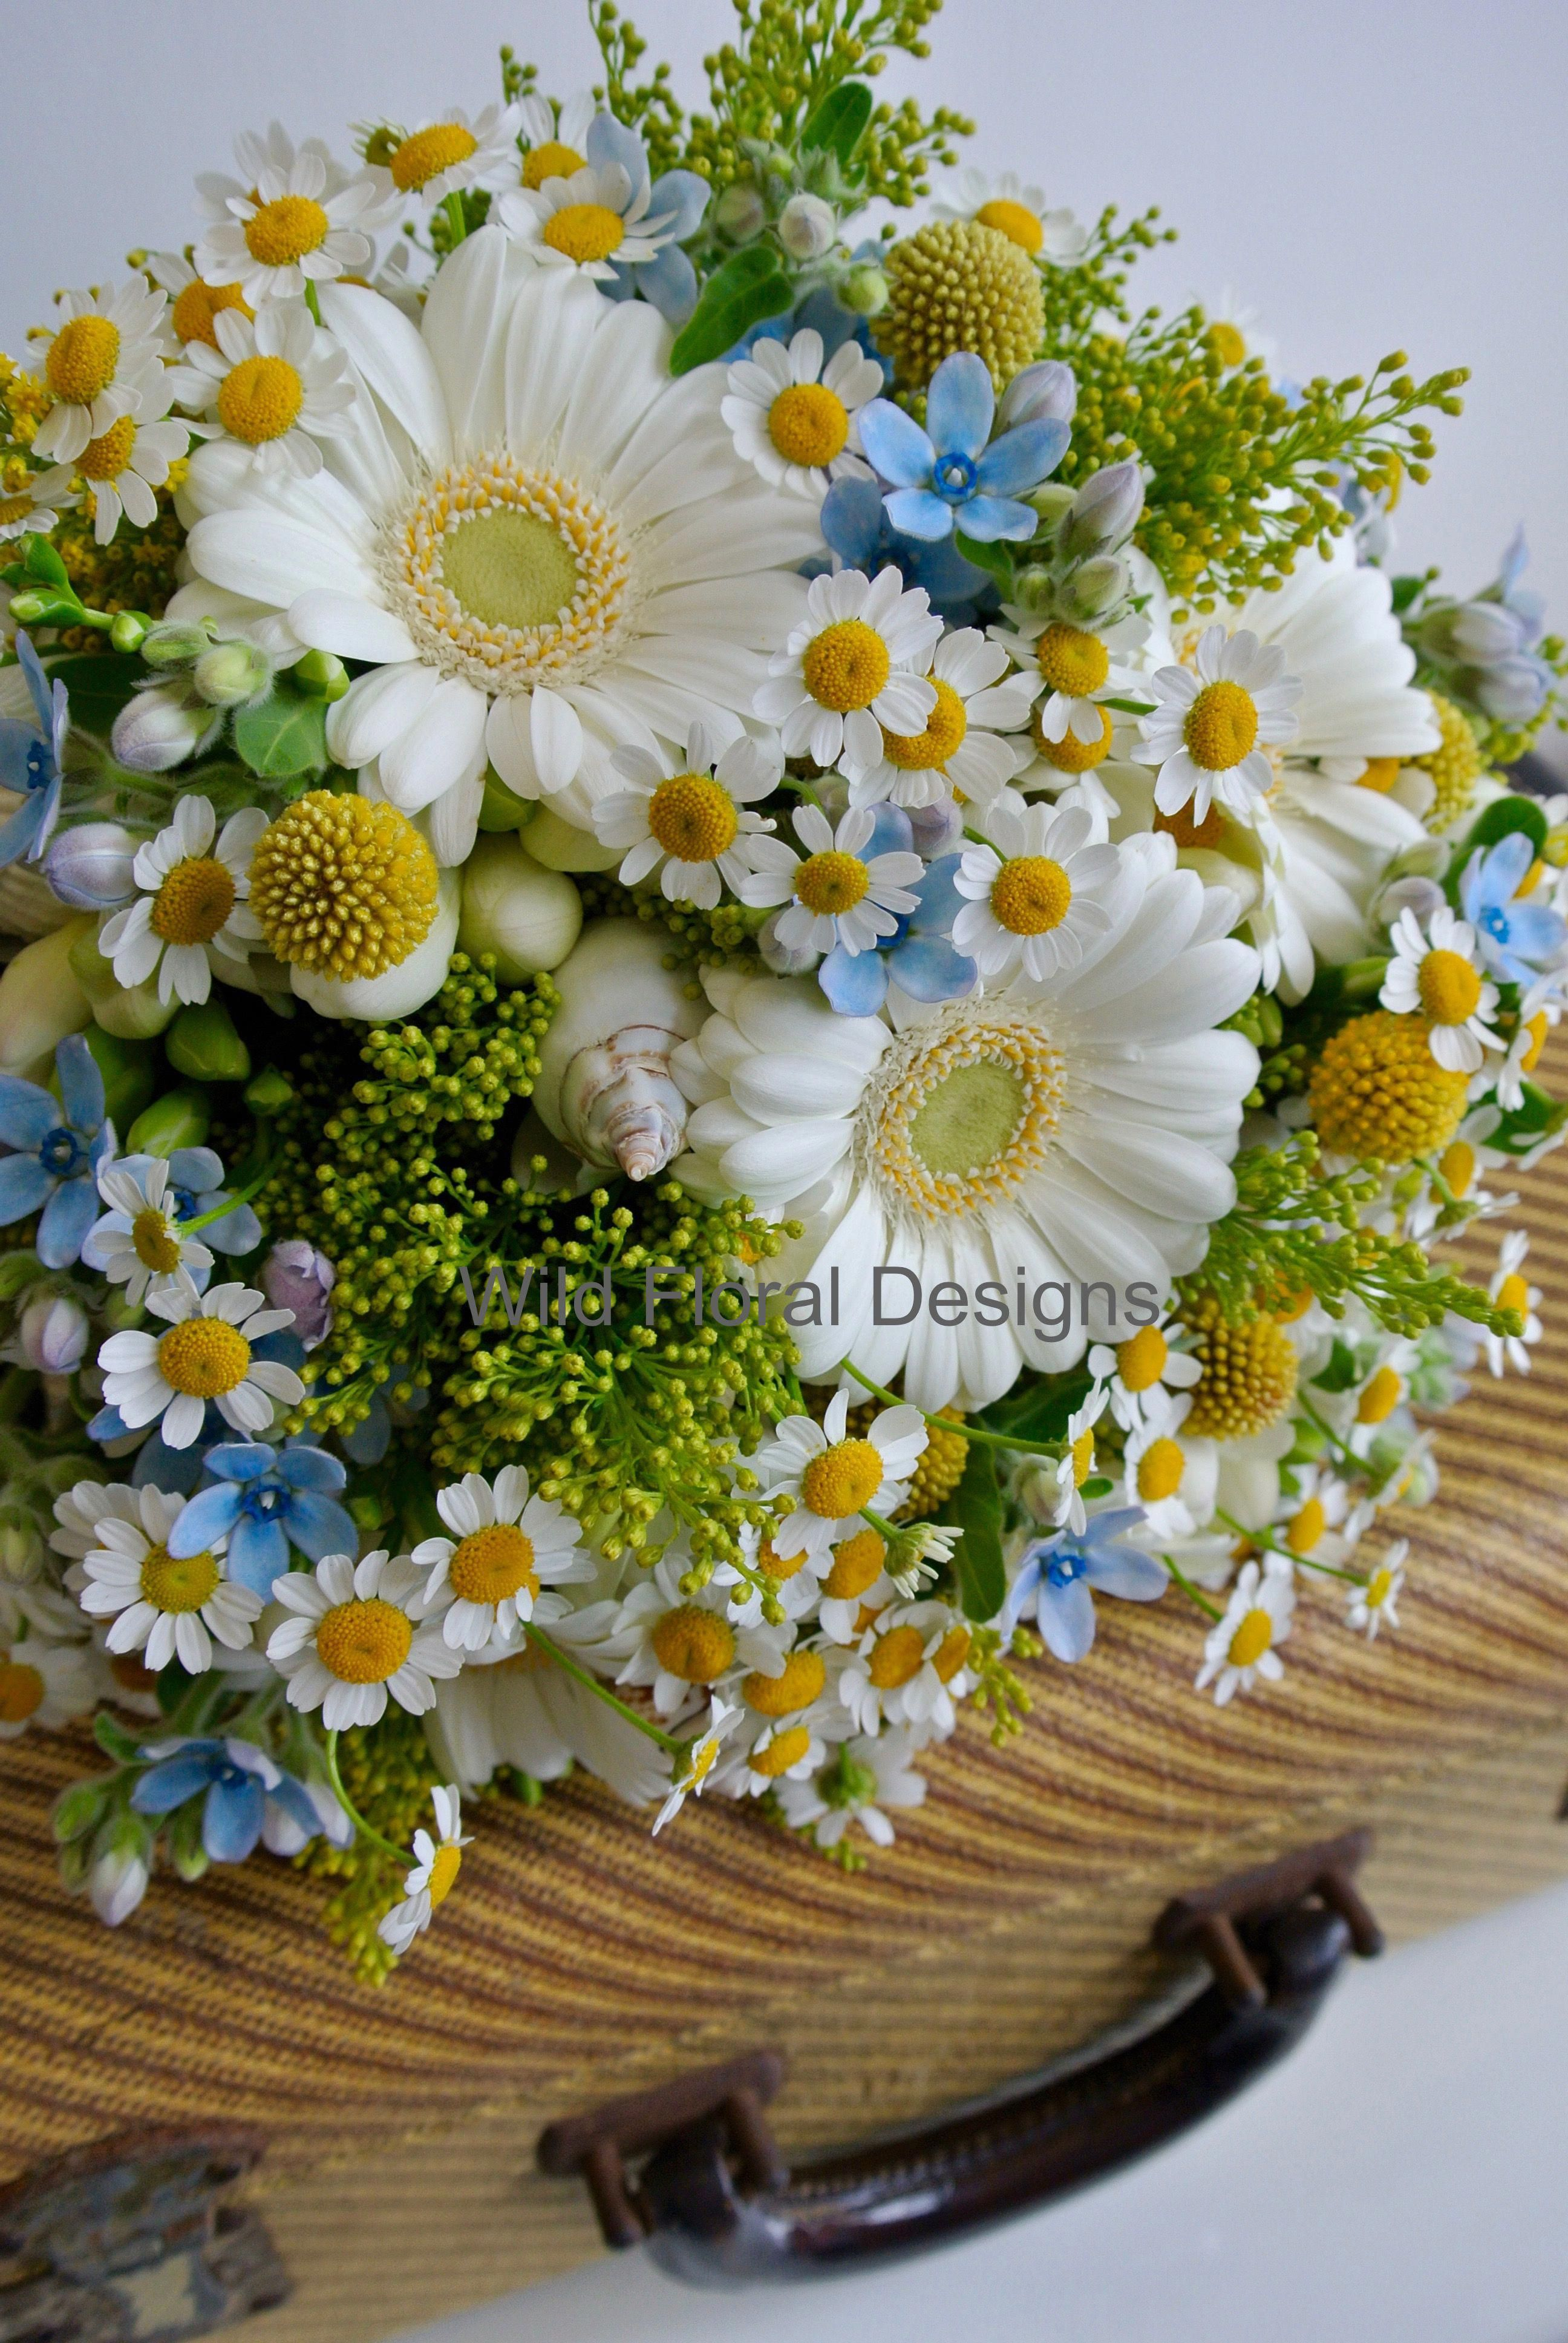 Summer Brides Bouquet White Germini Mini Gerbera Daisy Solidago Shells Freesia Englis Daisy Bouquet Wedding Daisy Wedding Flowers Flower Bouquet Wedding